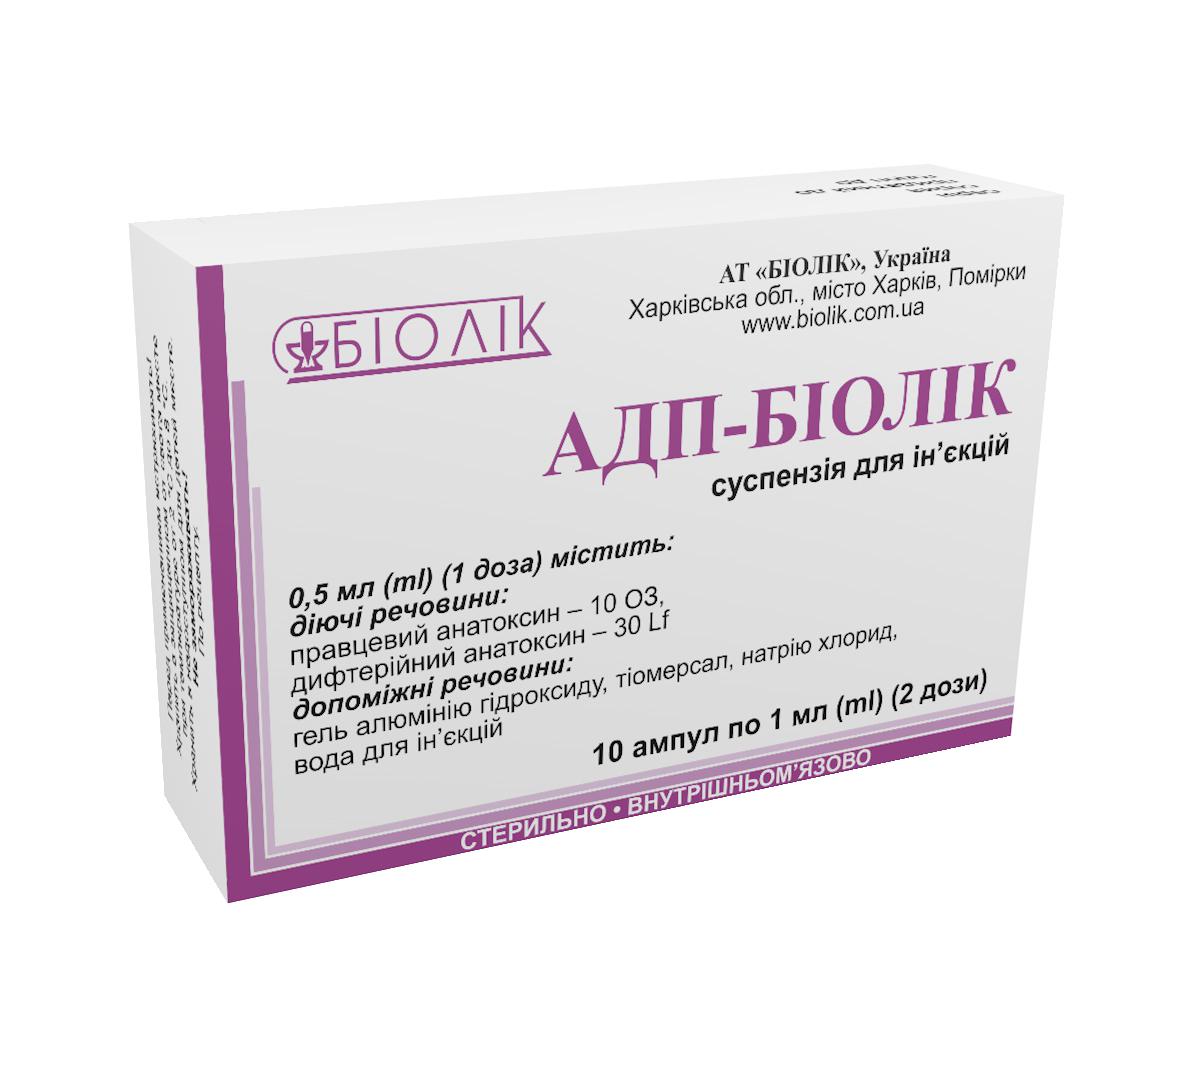 АДС-Биолек